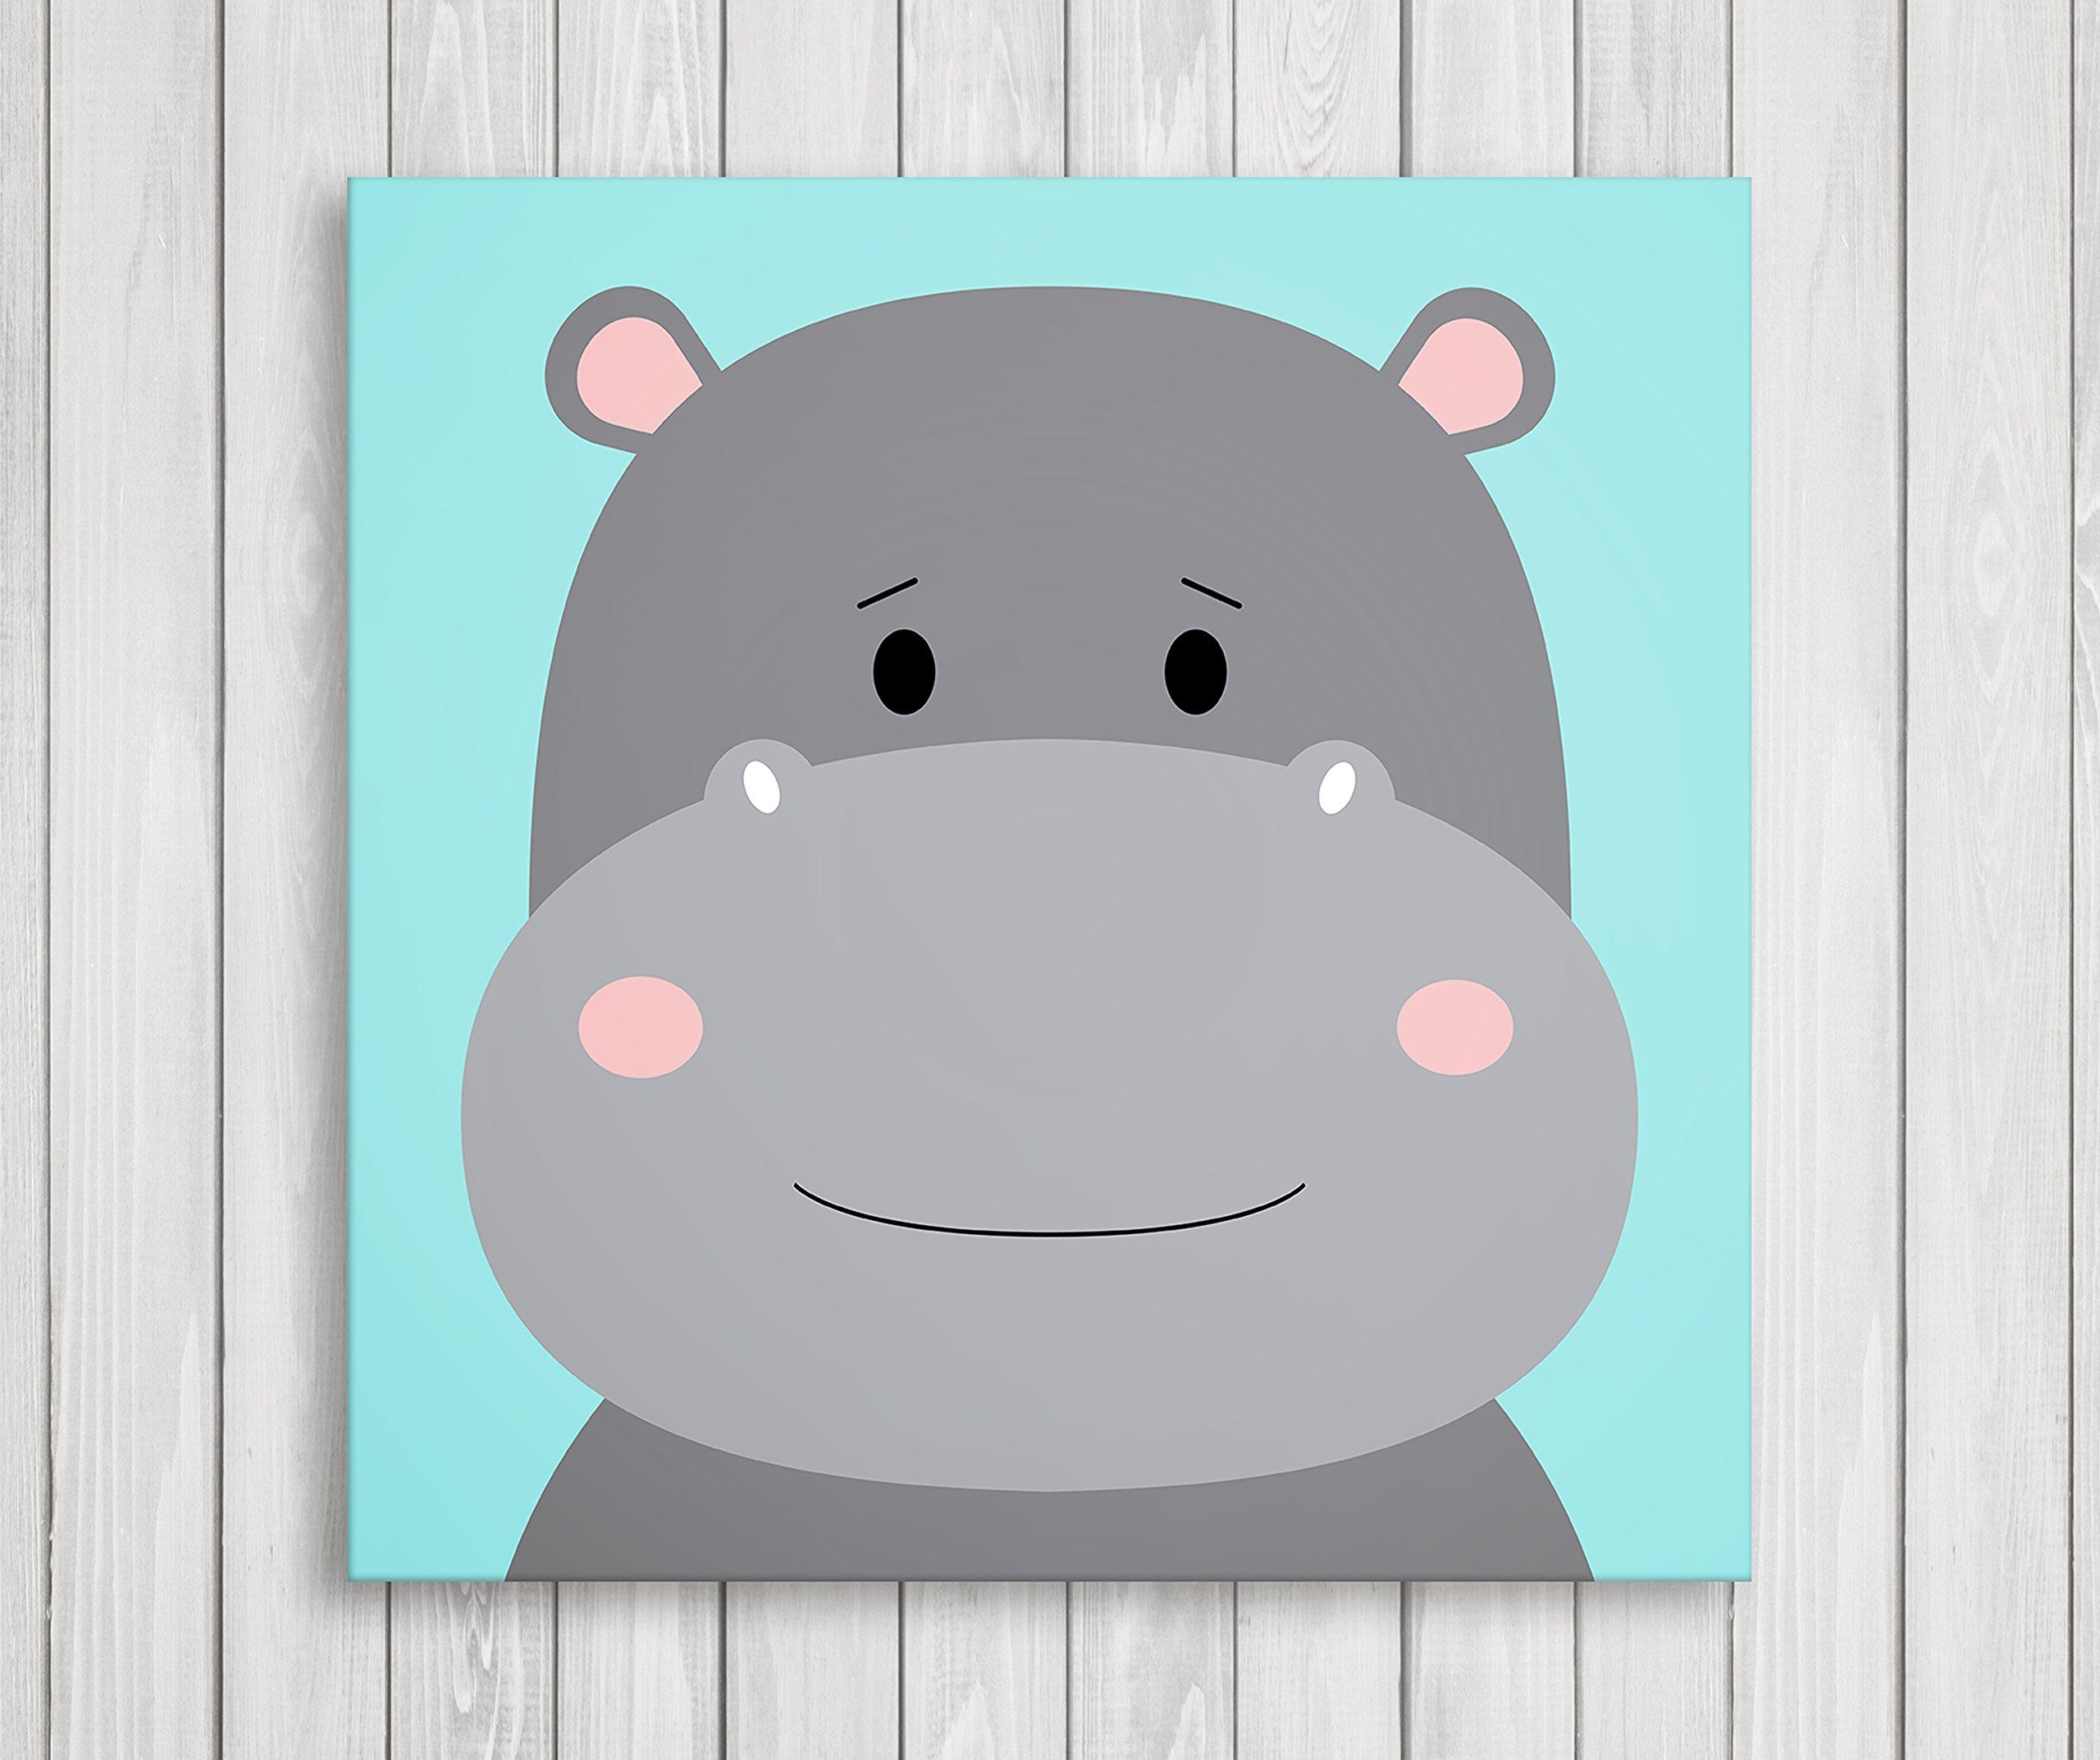 Cute Little Animals Nursery Wall Decor, Baby Room Canvas Art (11'' W x 11'' H, Hippo)